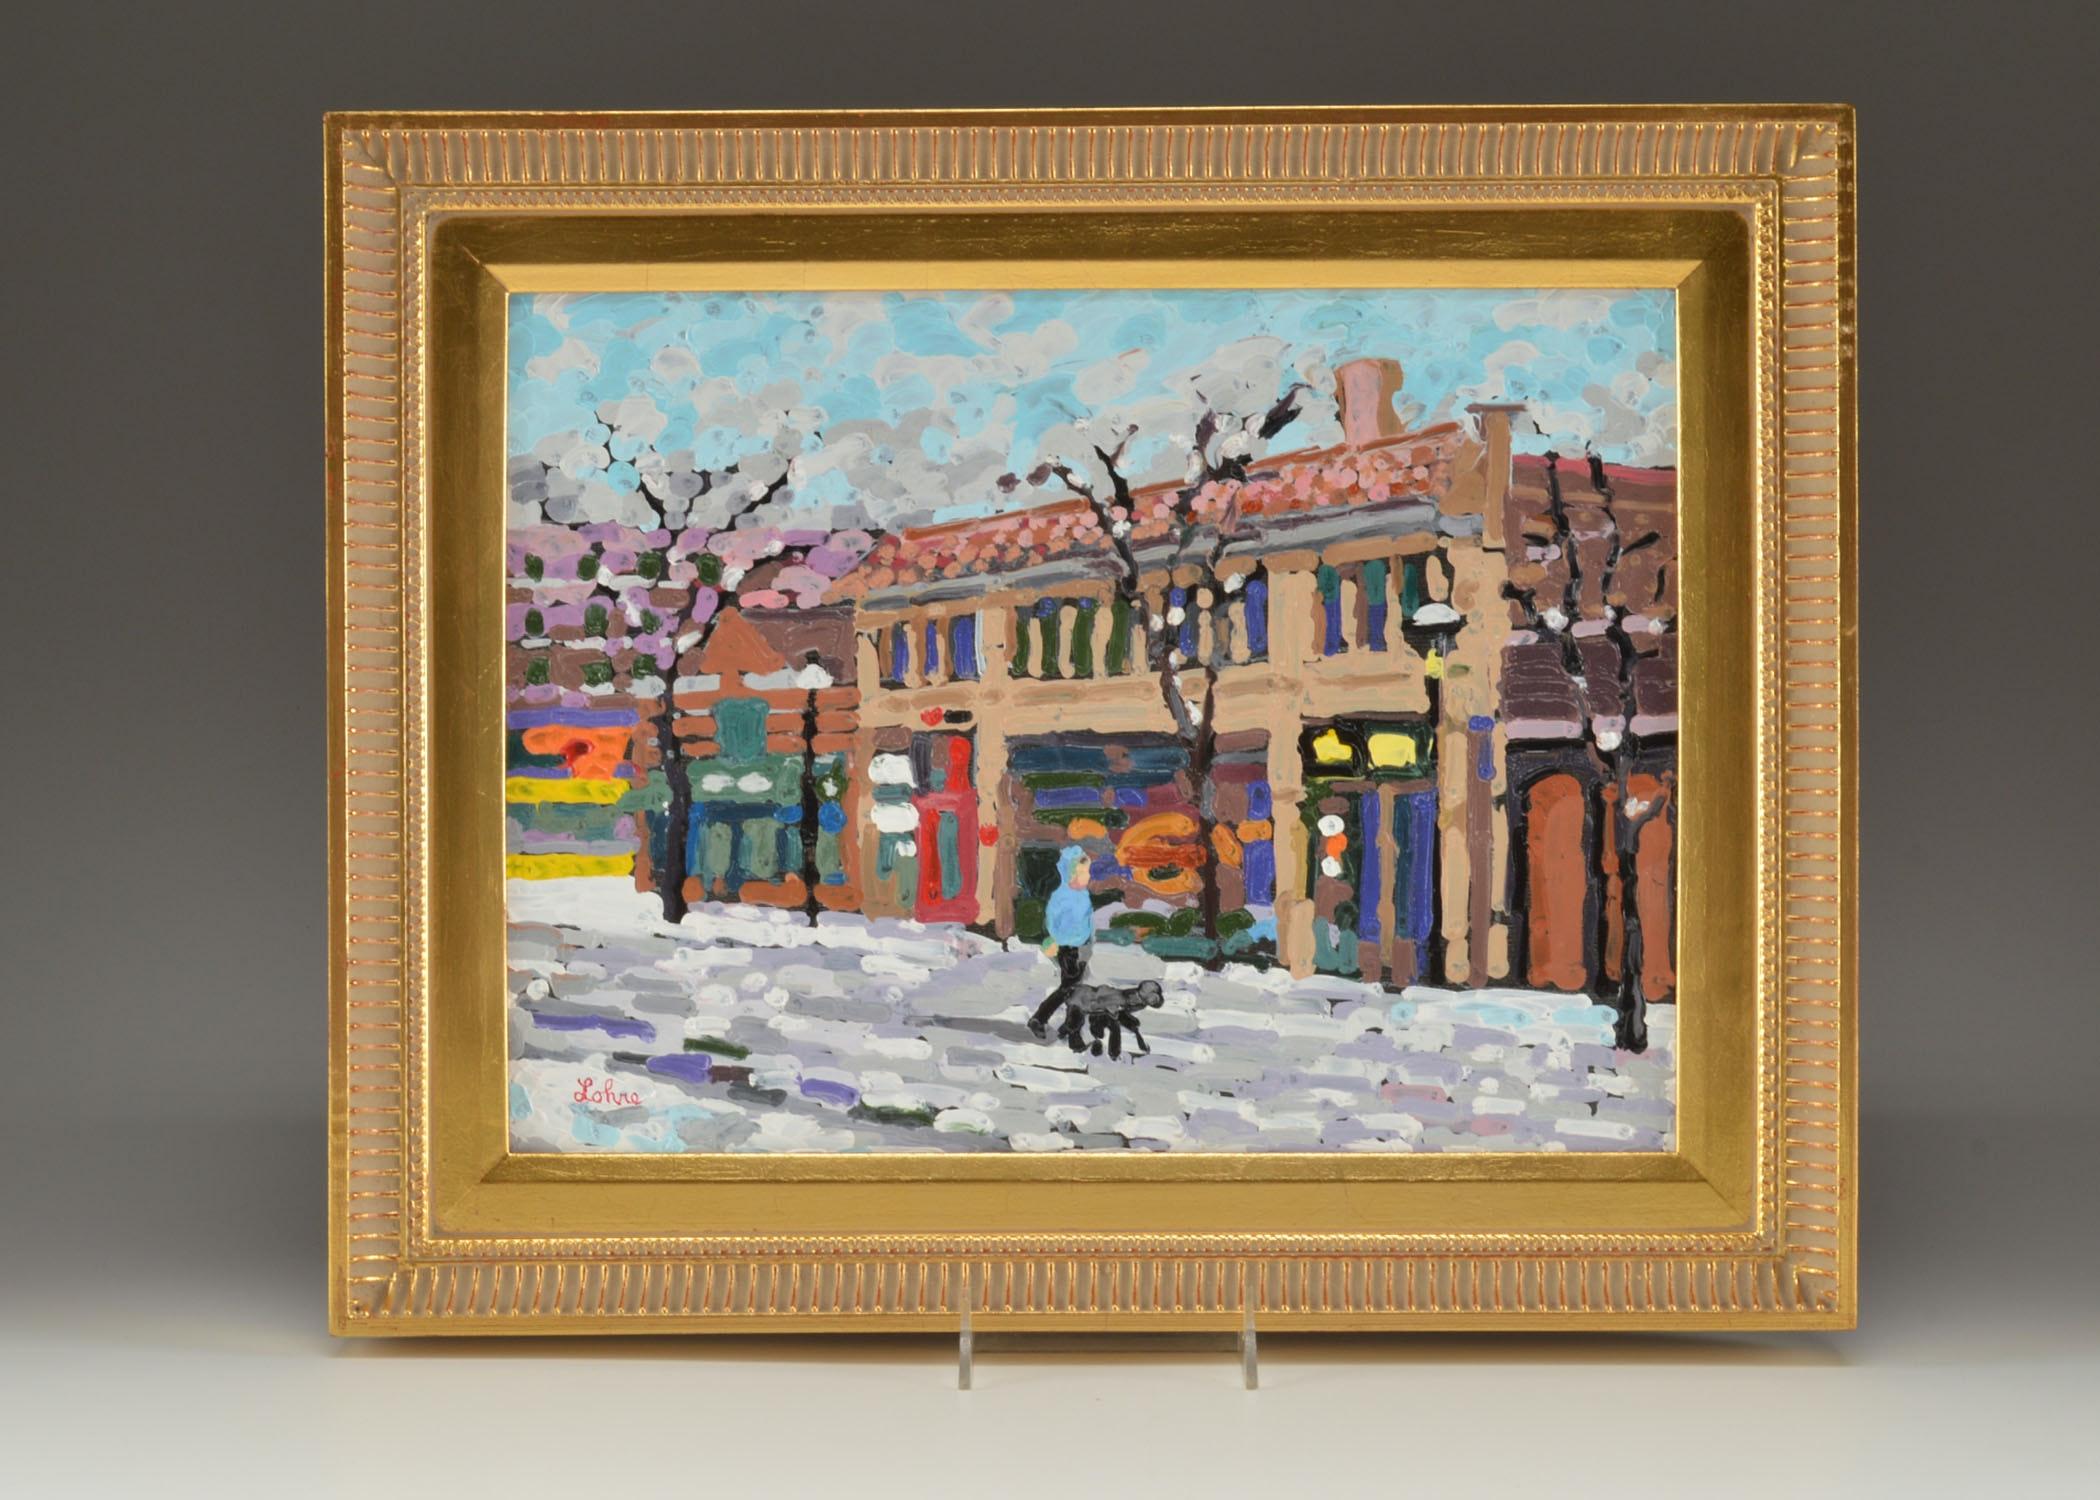 Original Tom Lohre Oil Pastel on Metal Painting